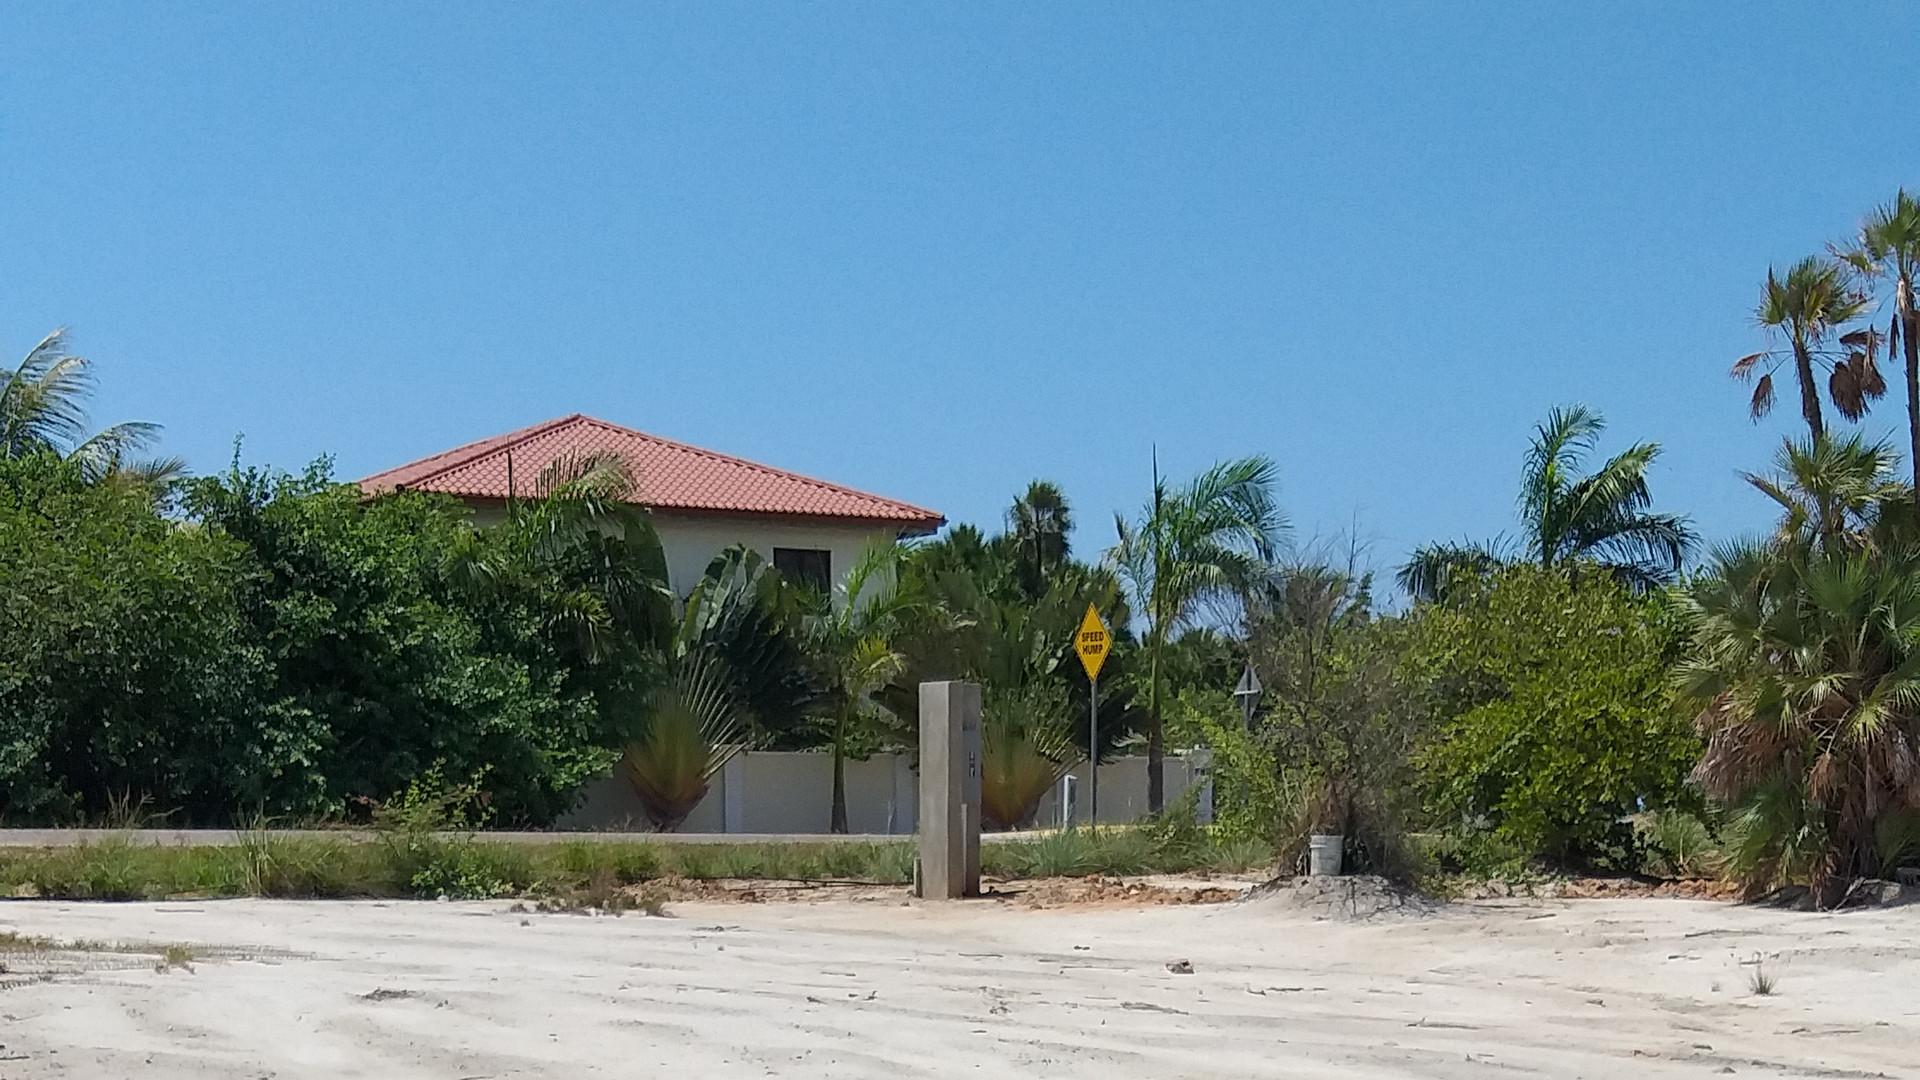 North Maya Beach